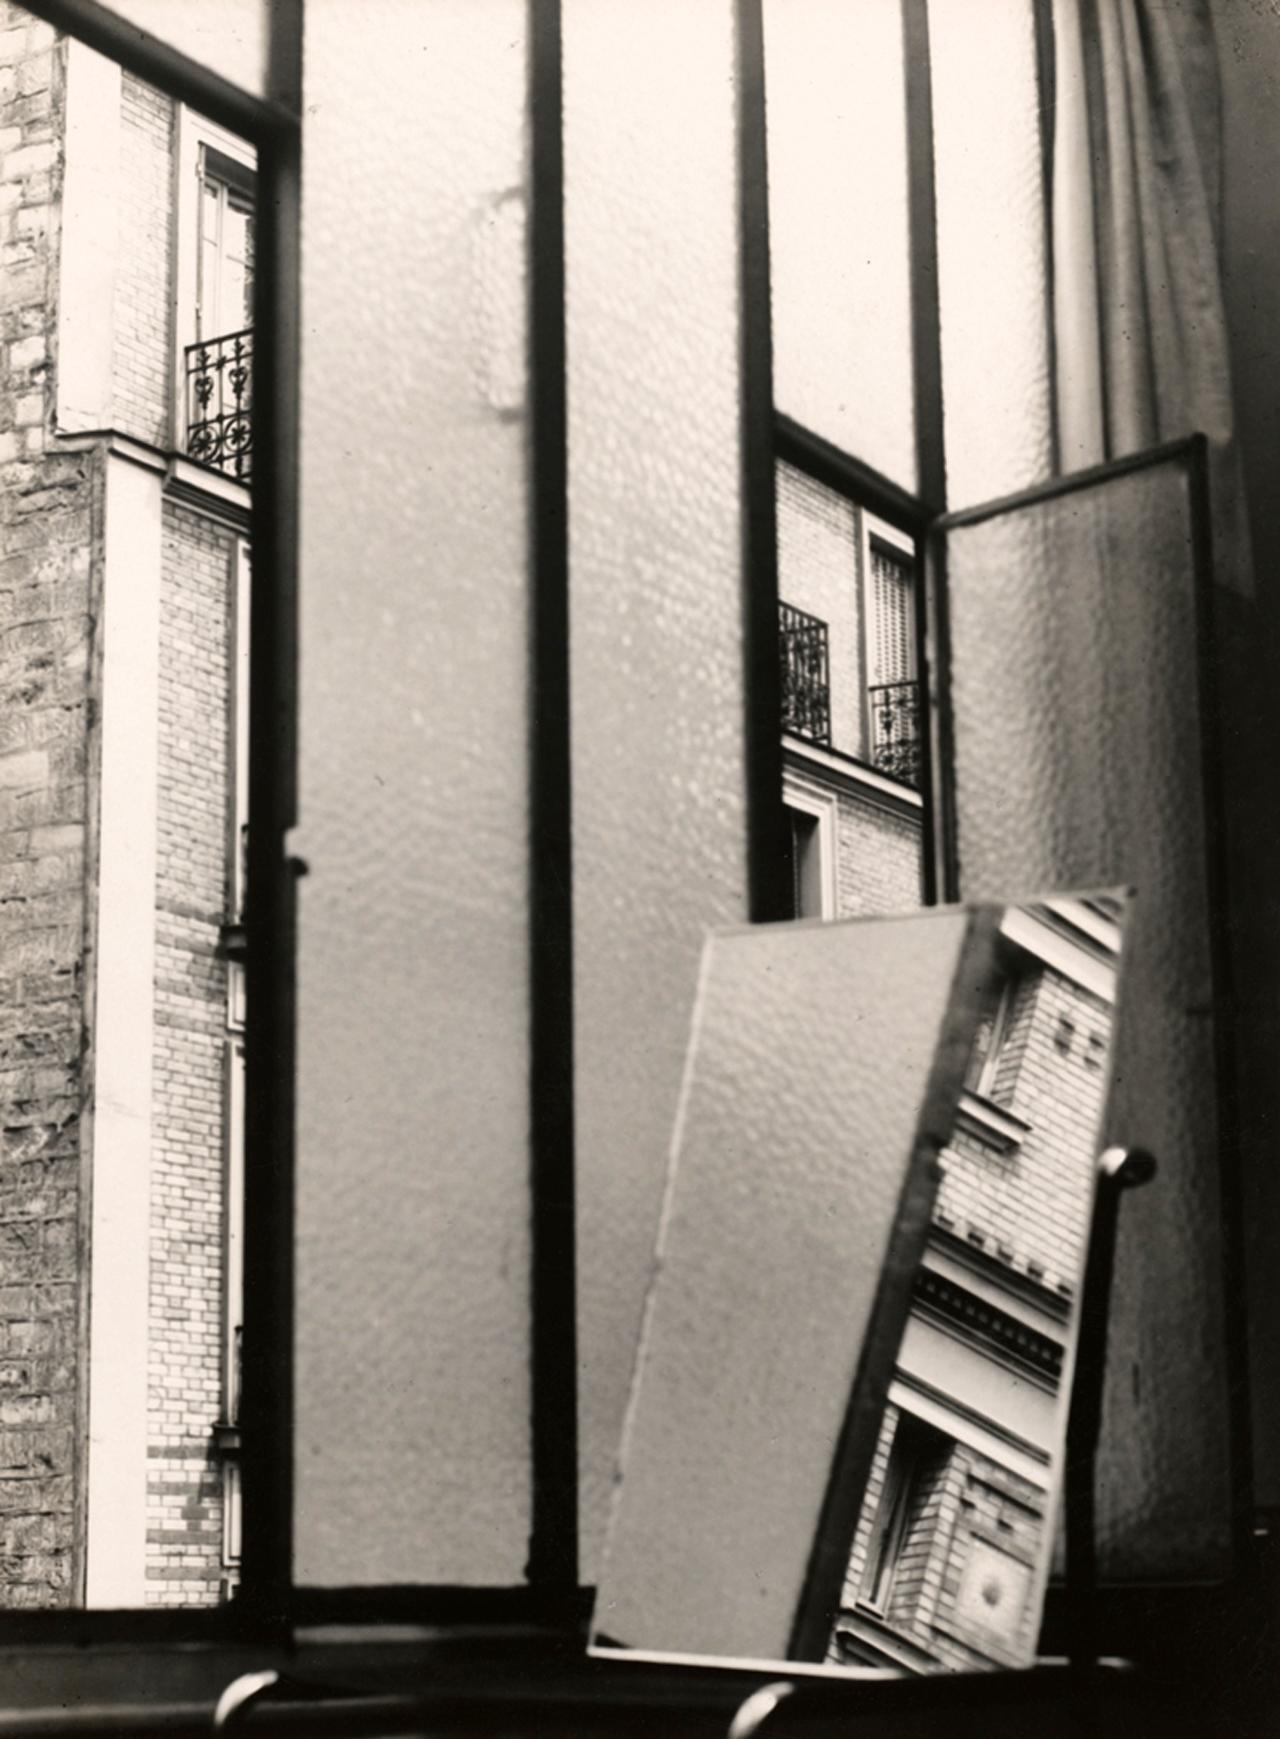 """Fenêtre"" (1929) gelatin silver print, 37 x 27 cm. Staatliche Museen zu Berlin, Kunstbibliothek. Florence Henri © Galleria Martini & Ronchetti (click to enlarge)"